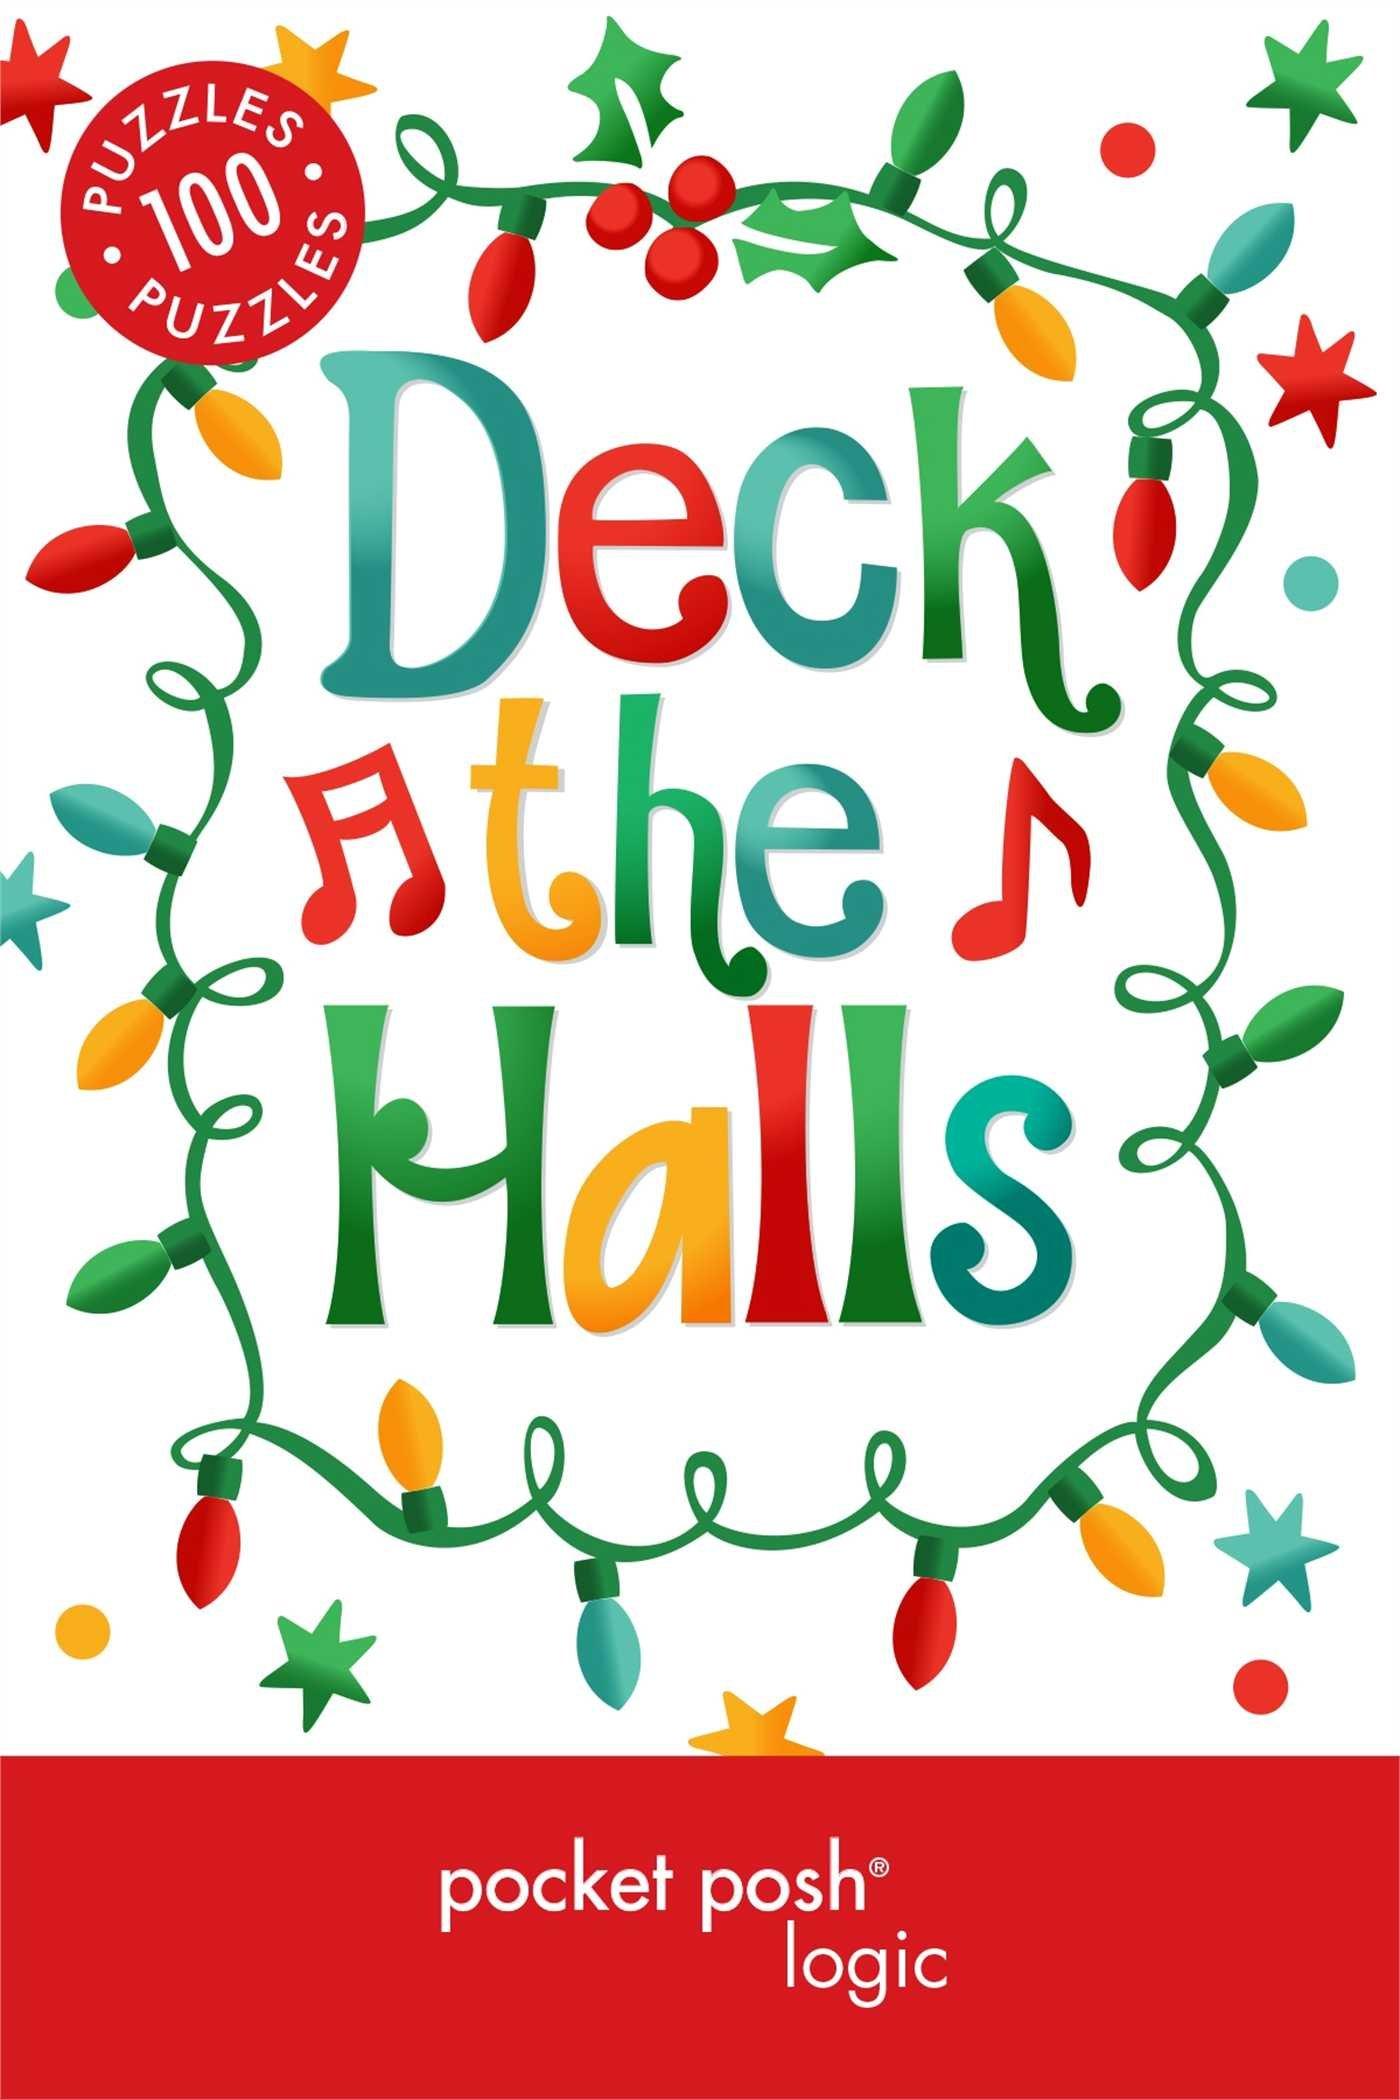 Download Pocket Posh Christmas Logic 5: 100 Puzzles Deck the Halls pdf epub